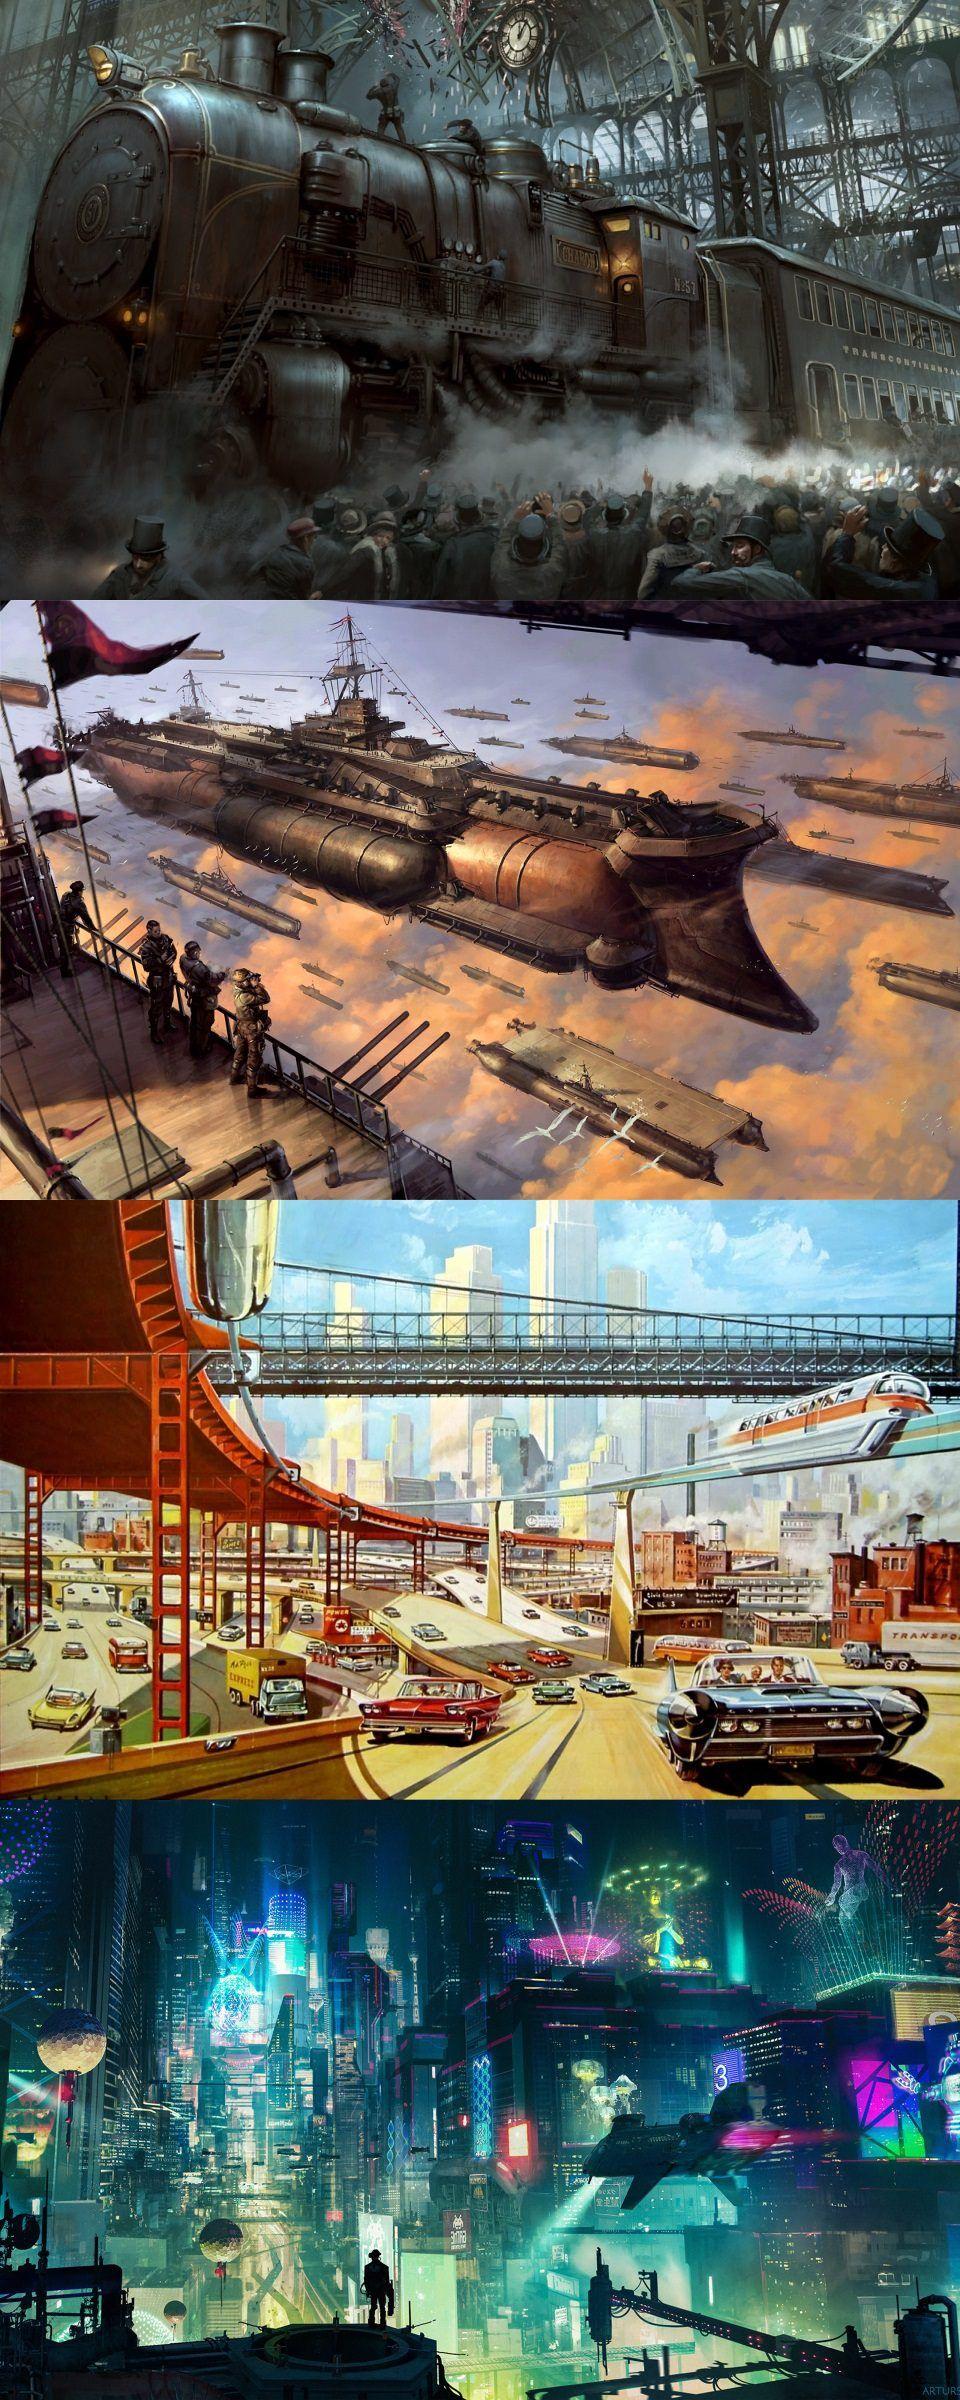 Steampunk Dieselpunk Atompunk Cyberpunk Age